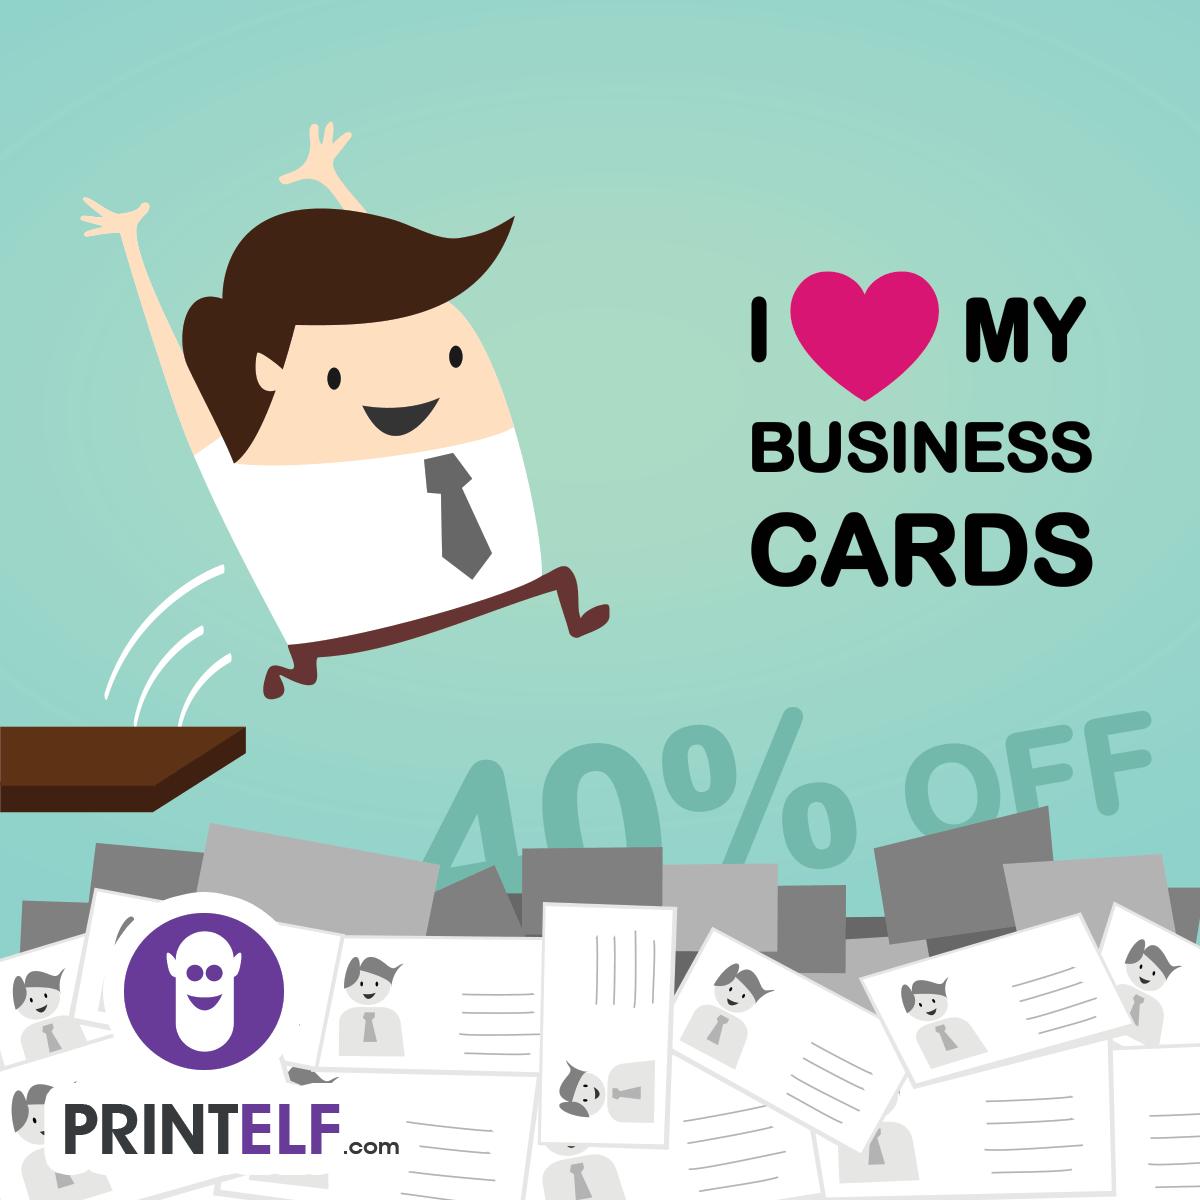 Pin by PrintElf - Printing & Design Service on Freelance Business ...